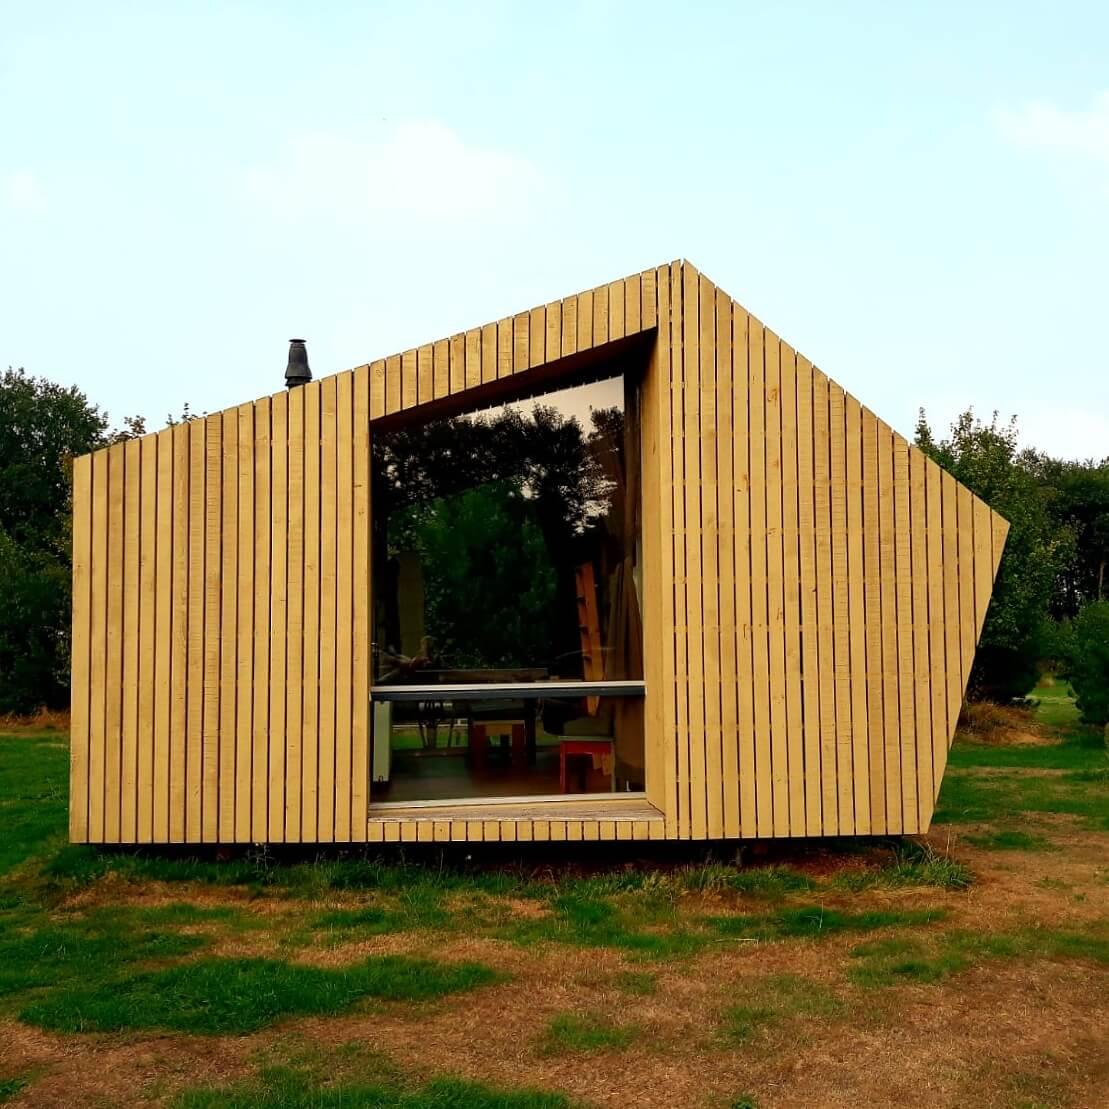 Camping De Lemeler Esch huisje